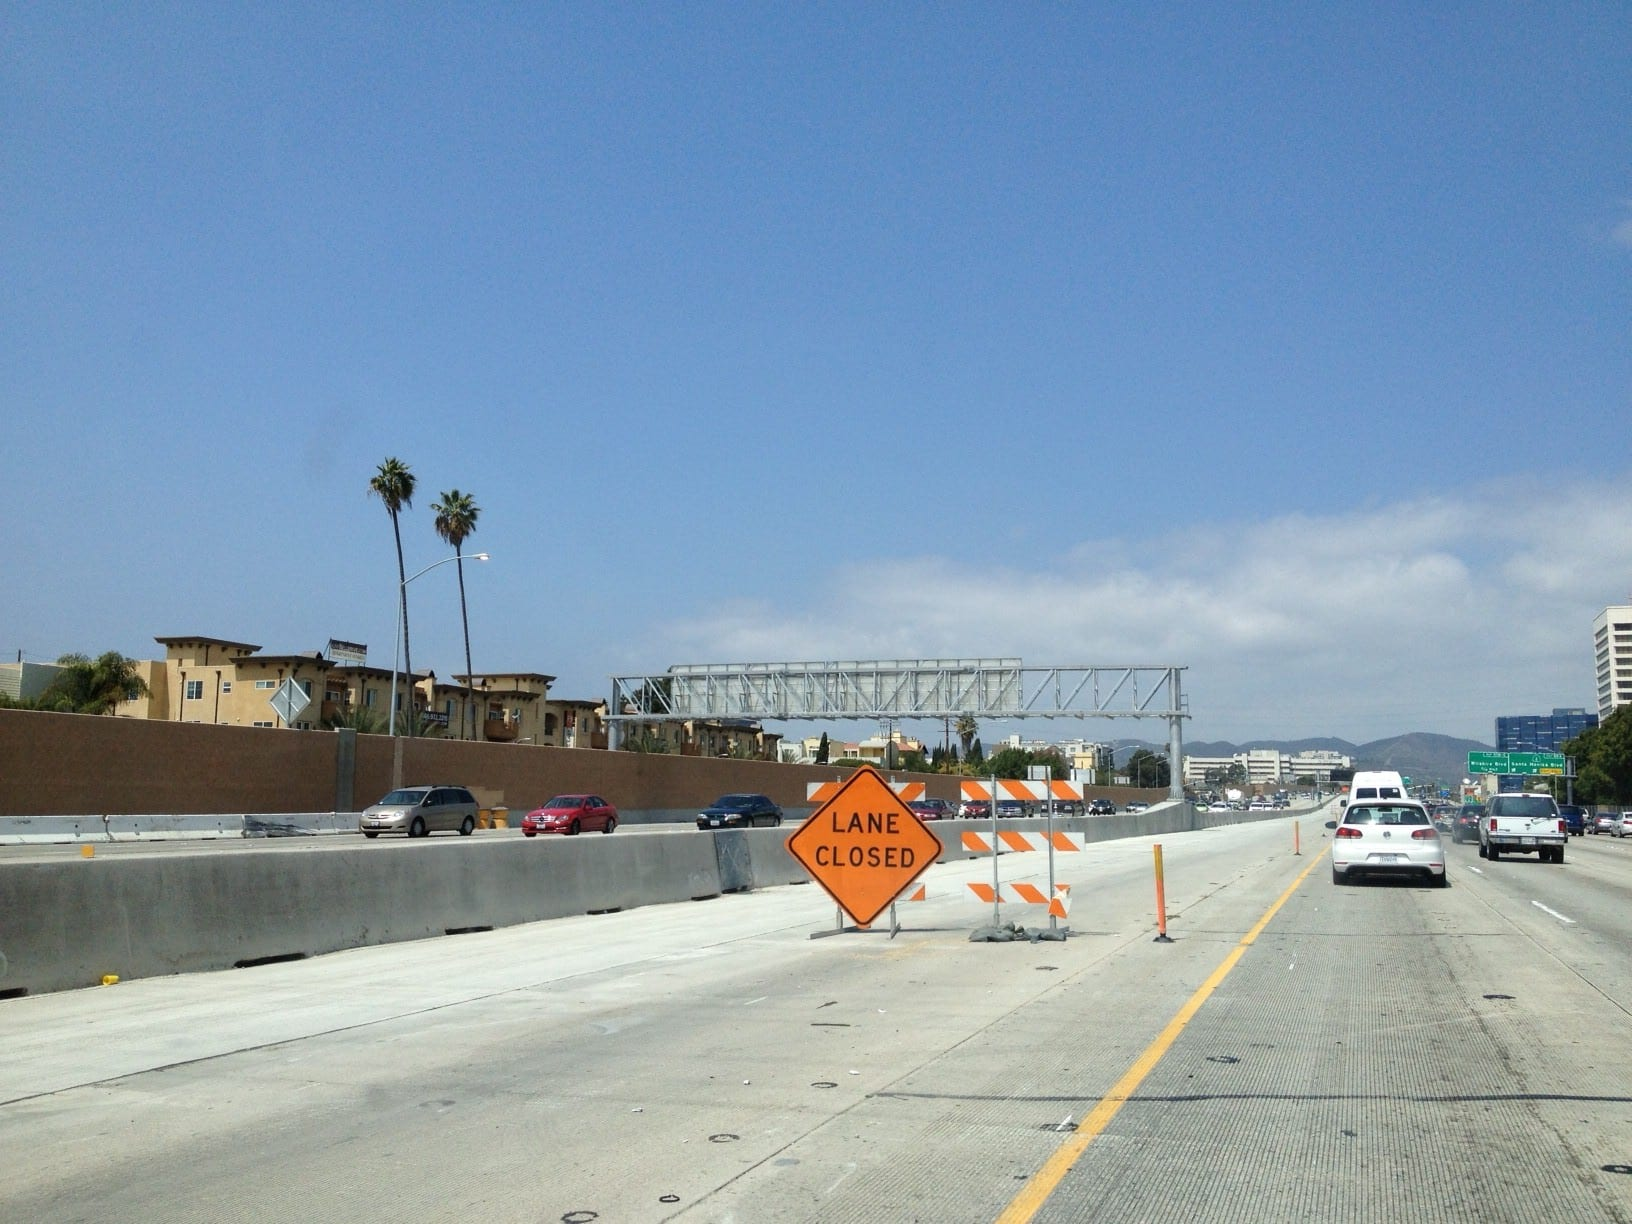 Earlier lane preparation work on northbound carpool lane in West L.A.